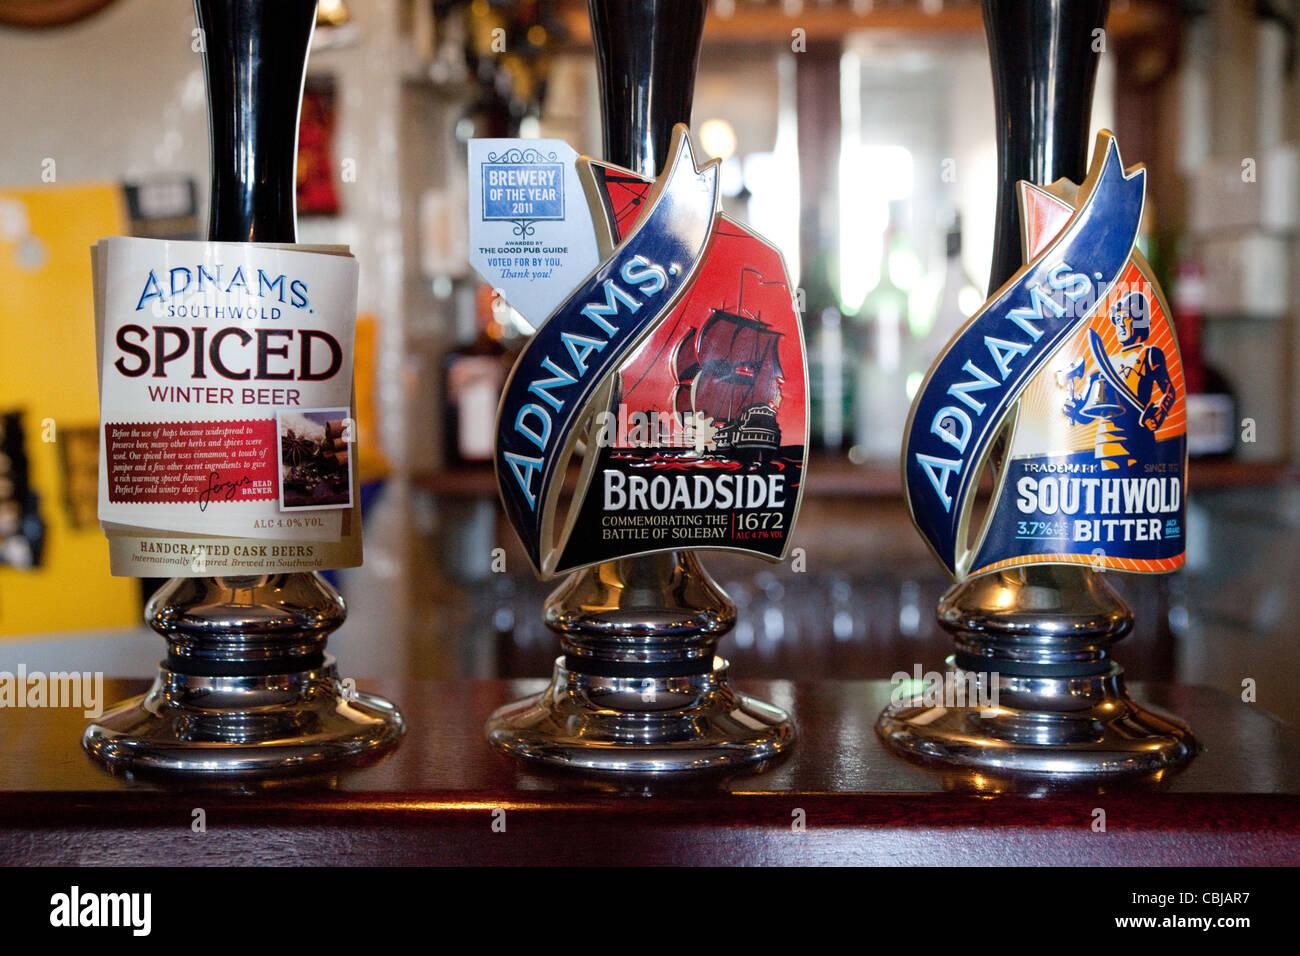 Adnams beer pumps, The Bell inn, Middleton, Suffolk UK - Stock Image